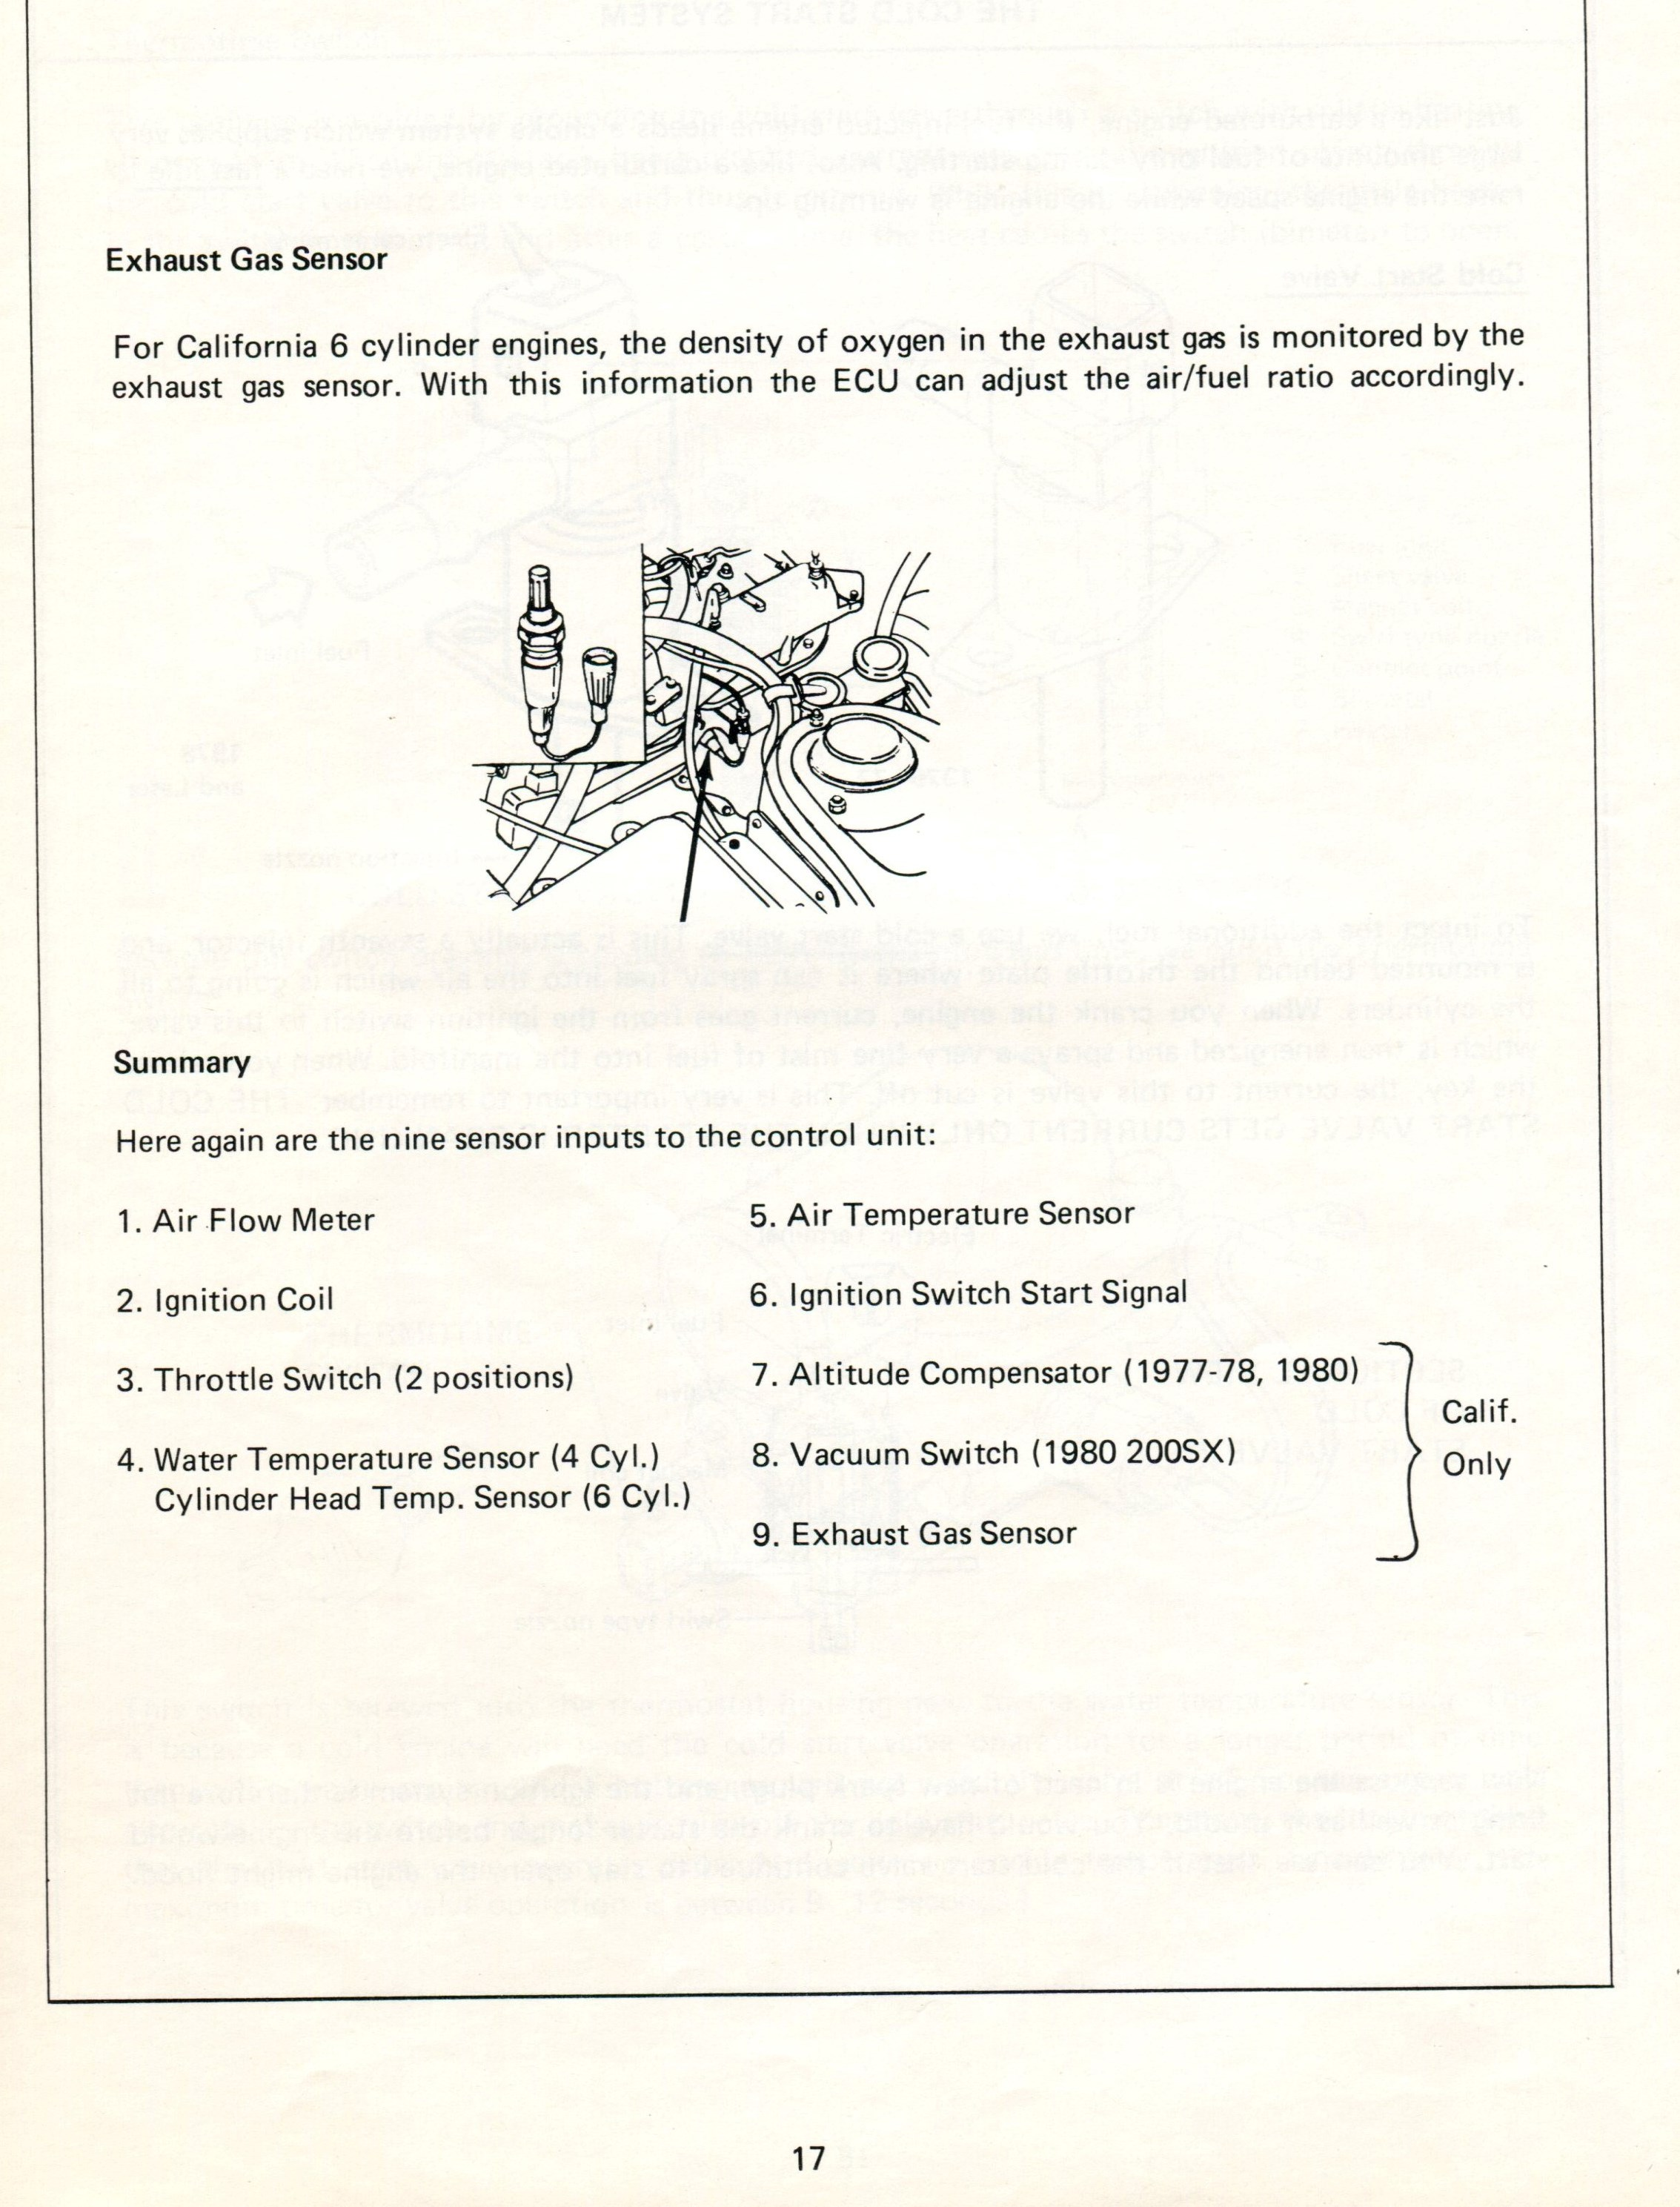 datsun 510 part diagrams  datsun  free engine image for